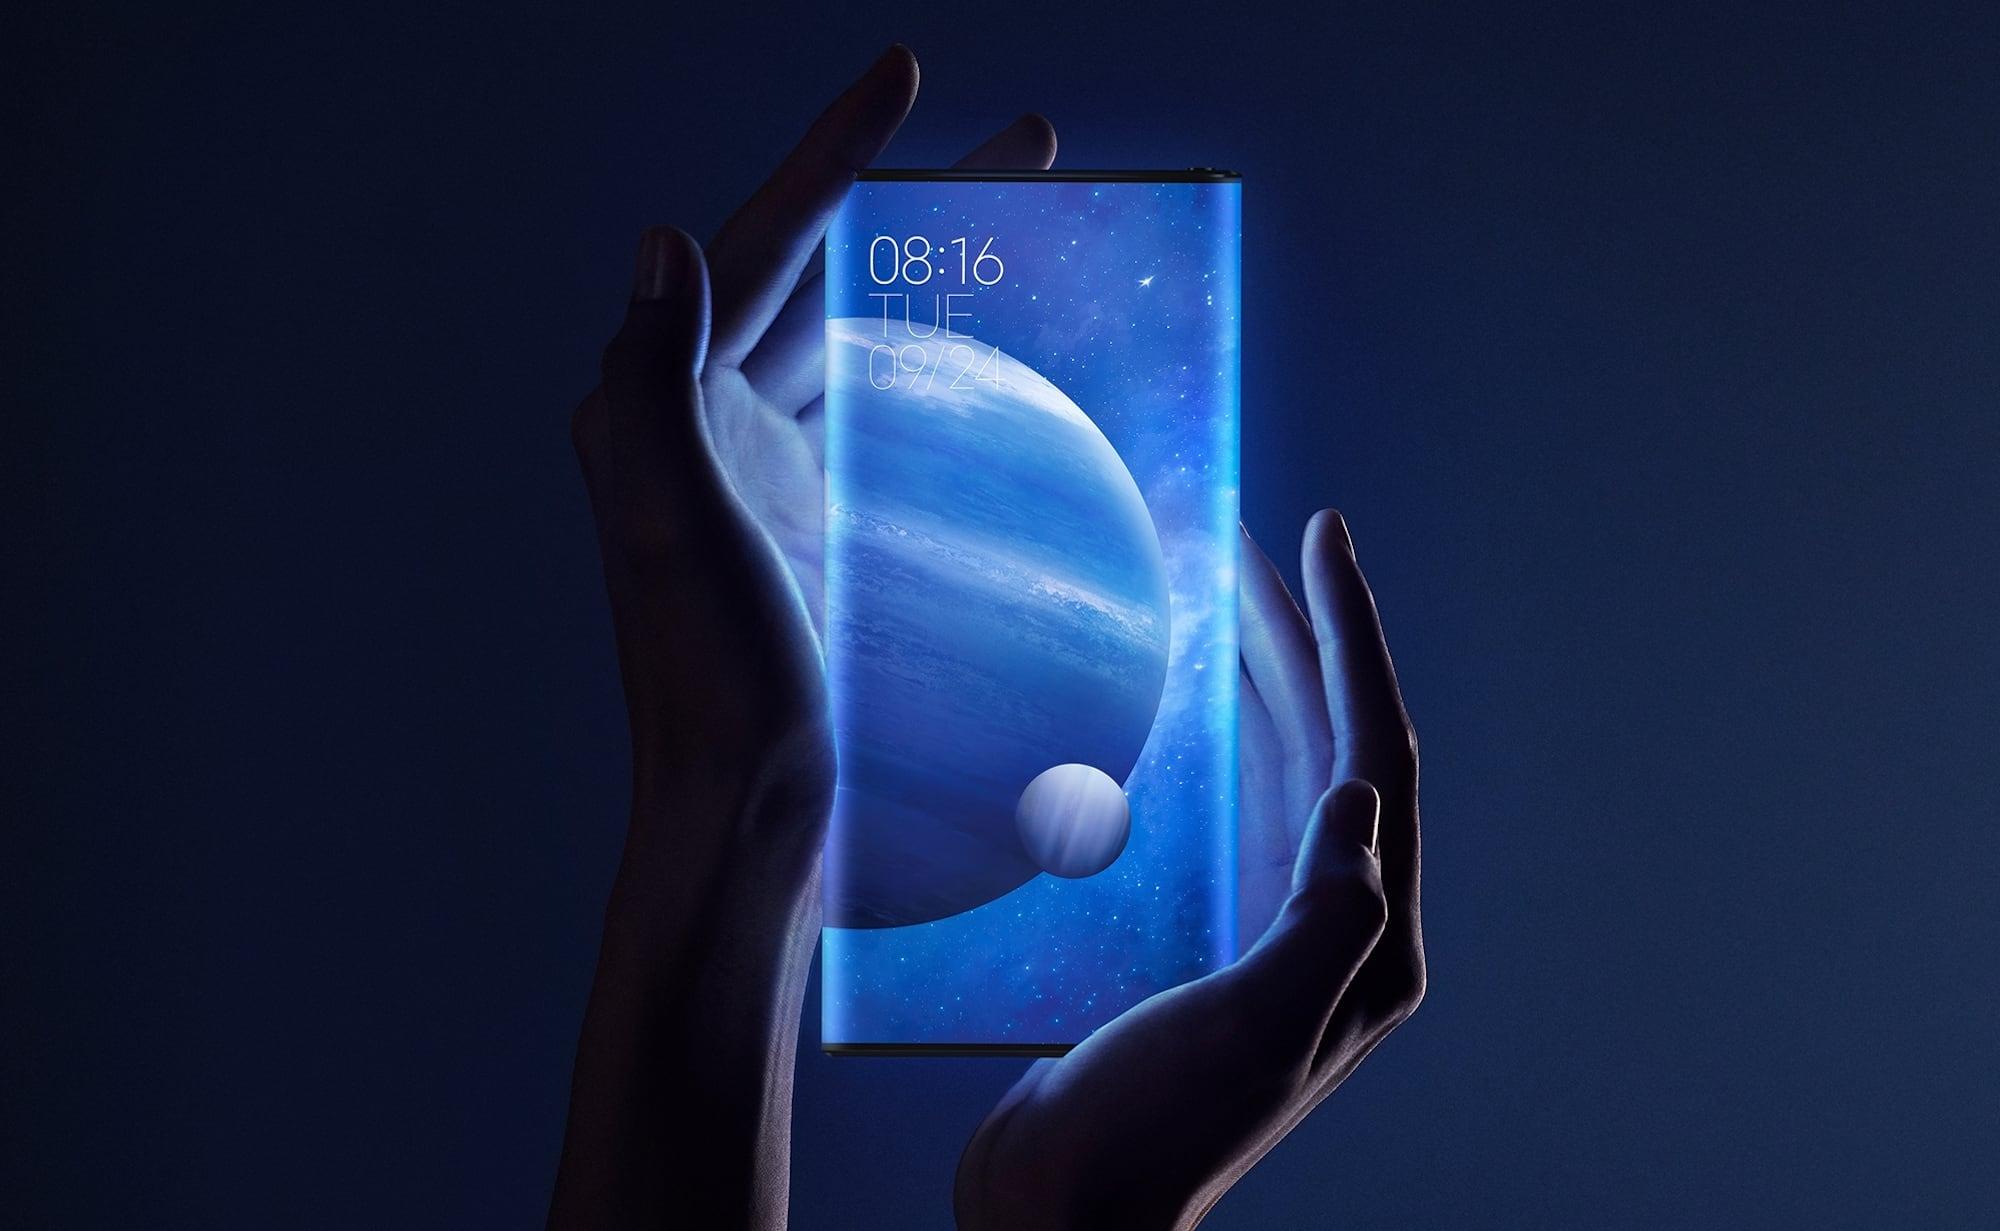 Xiaomi Mi MIX Alpha Surround-Screen Smartphone has a wraparound display